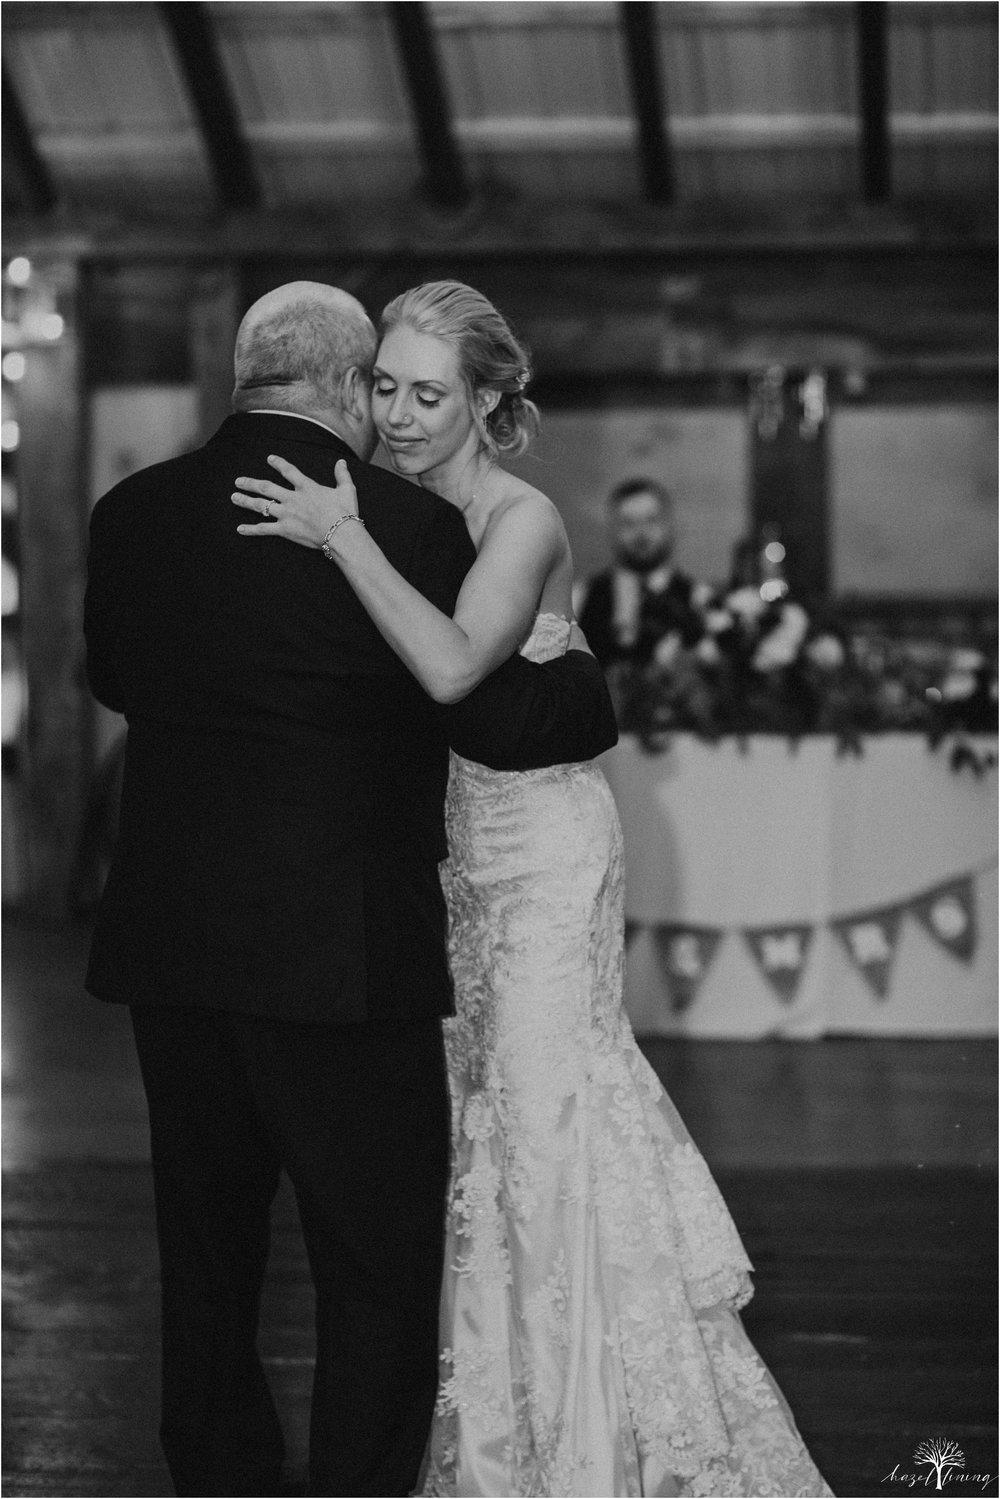 briana-krans-greg-johnston-farm-bakery-and-events-fall-wedding_0160.jpg